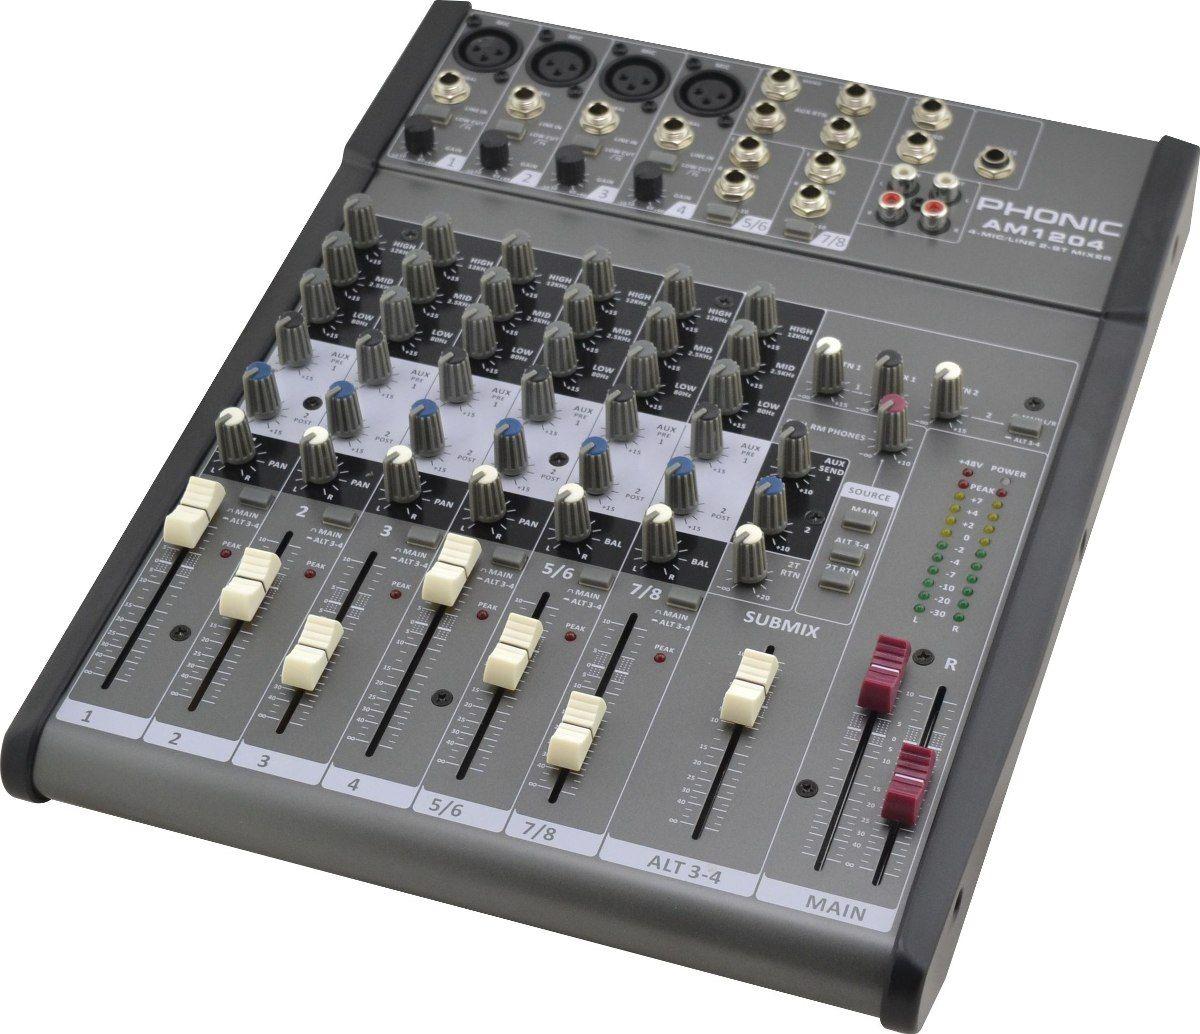 MÍXER ANALÓGICO PHONIC AM1204